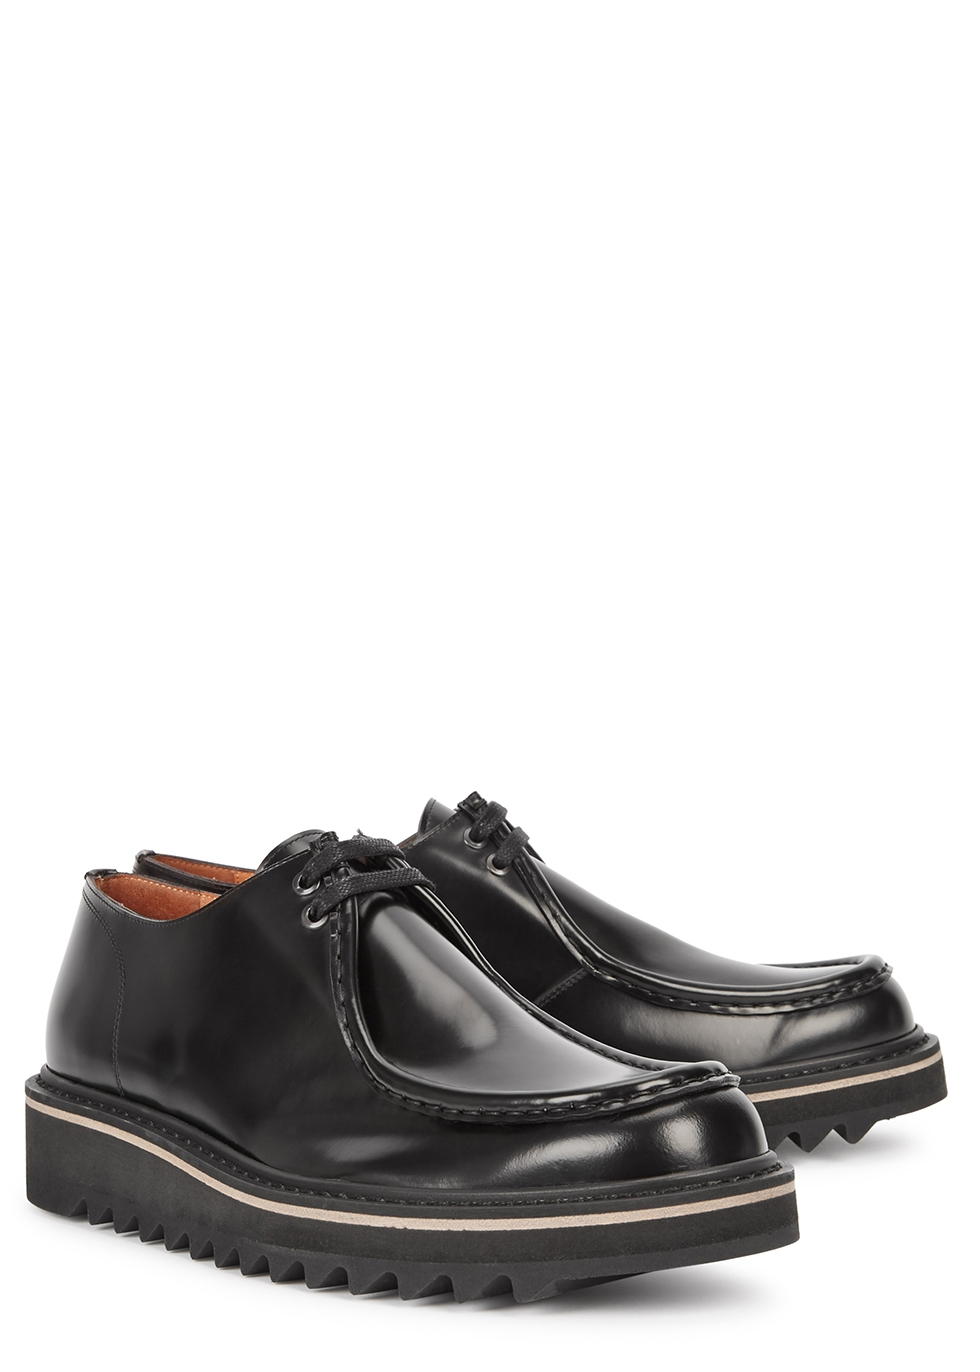 Black leather flatform shoes - Dries Van Noten